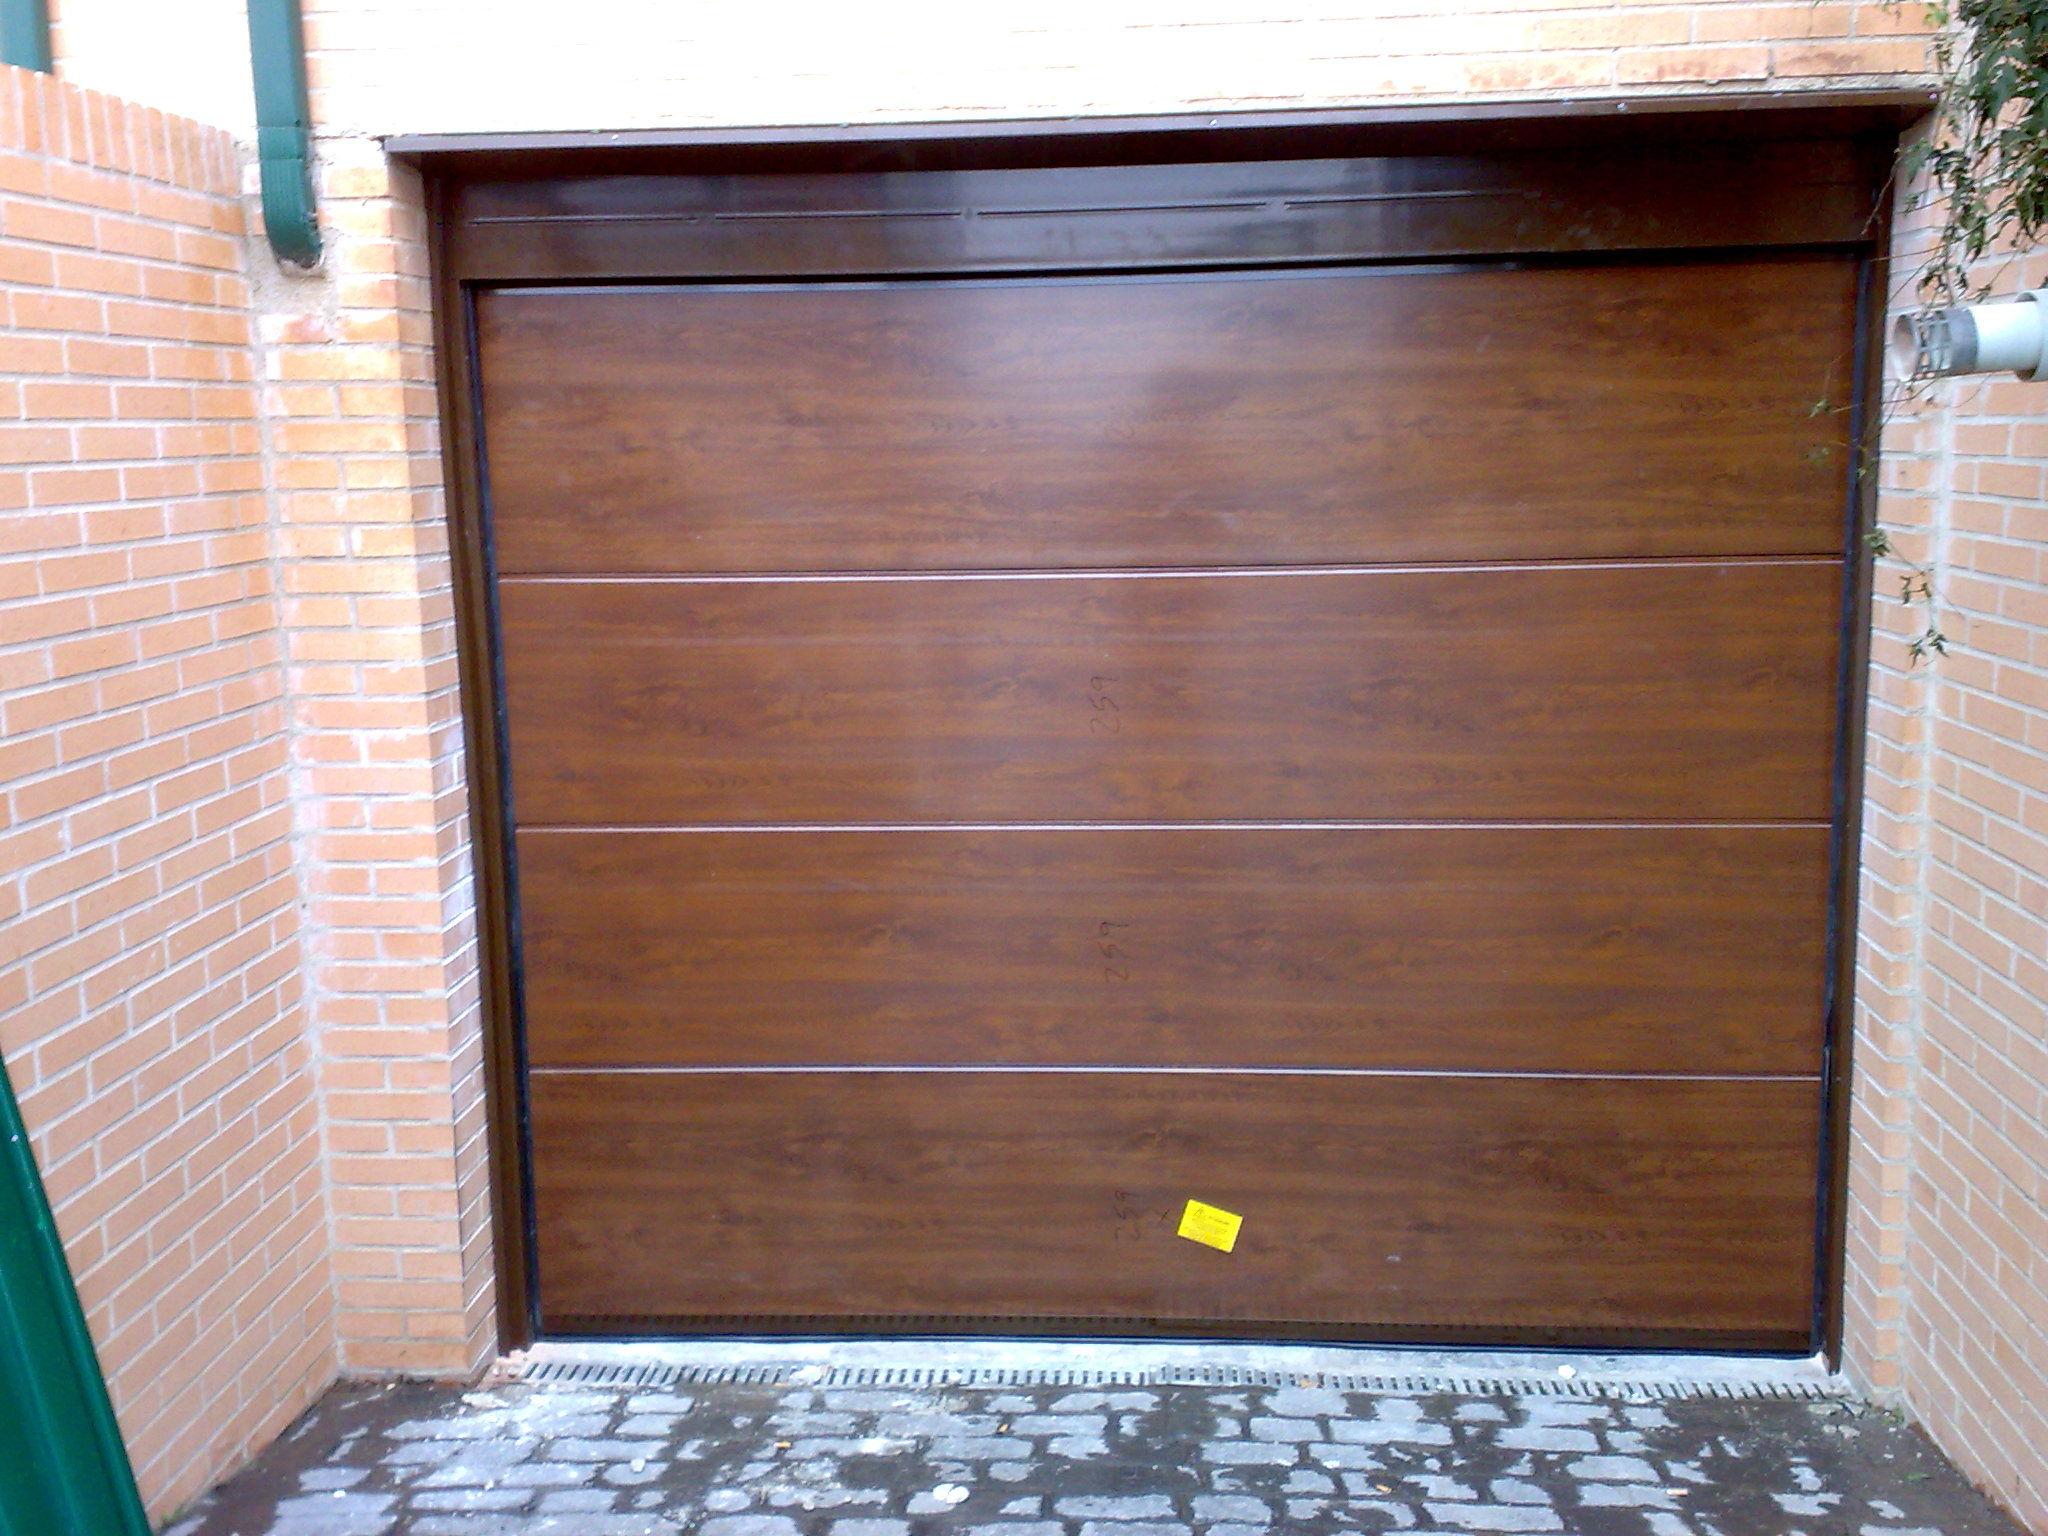 Puerta seccional de garaje imitacion madera